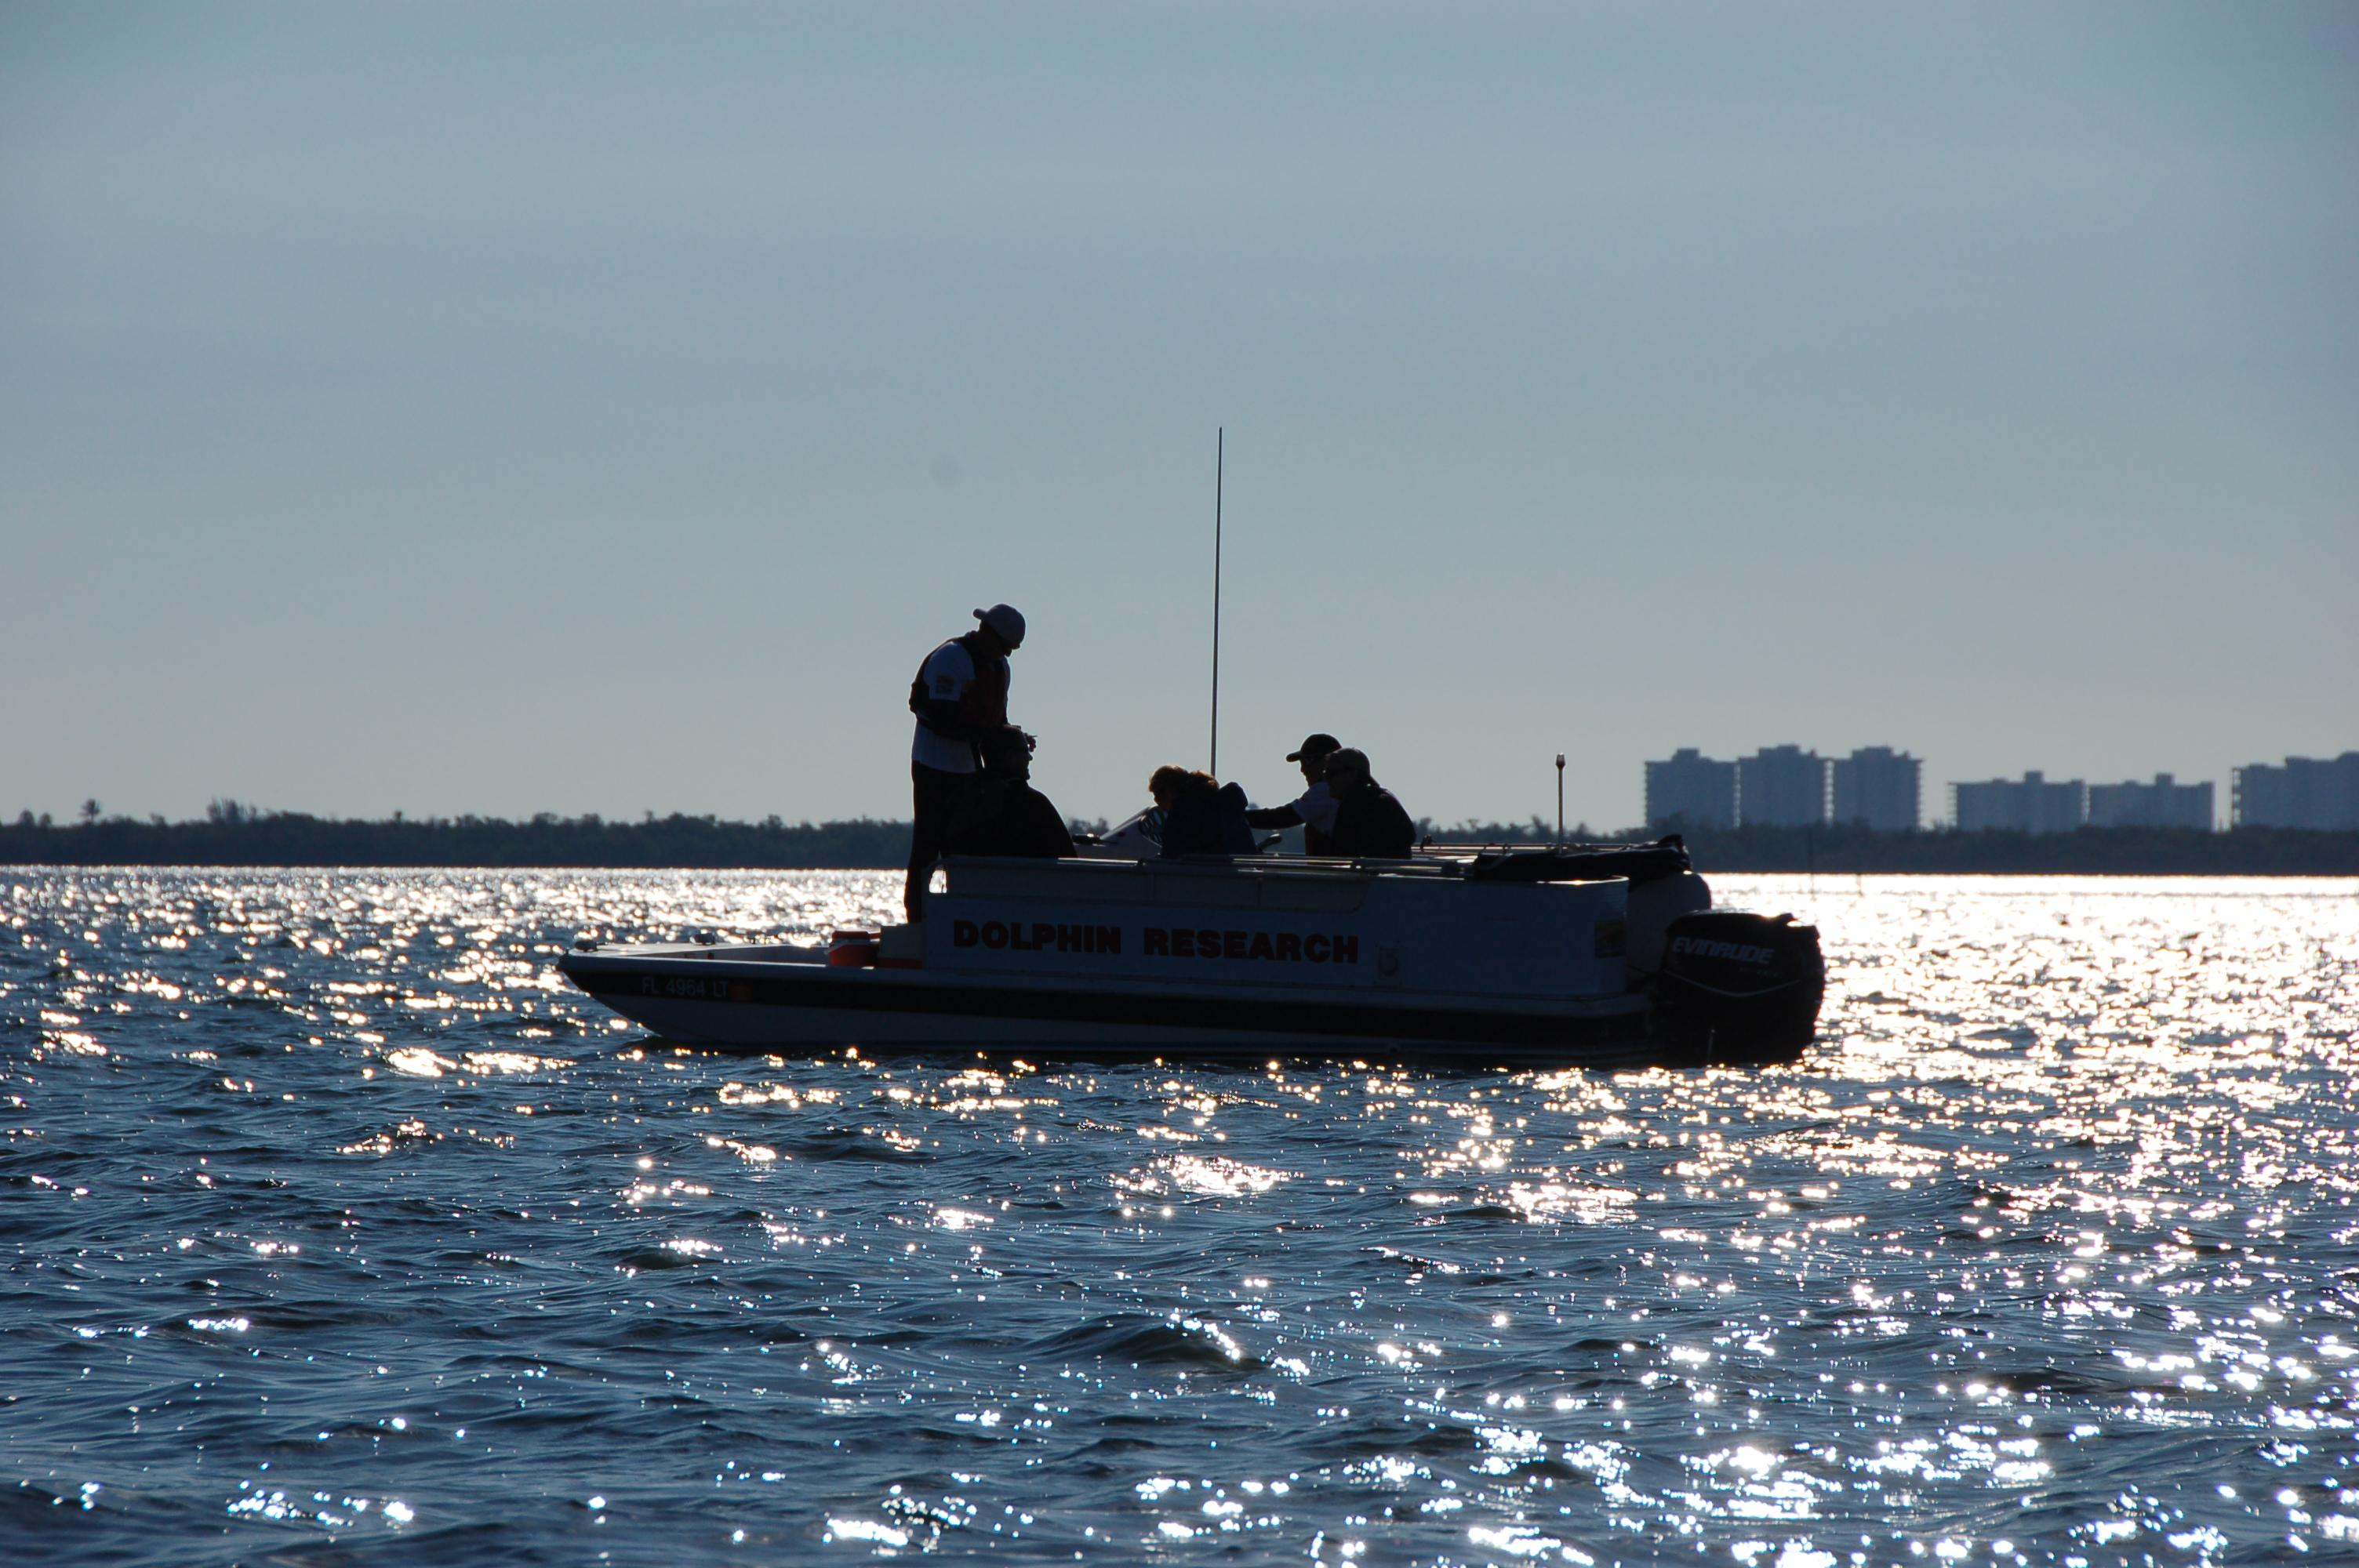 boating_12195669284_o